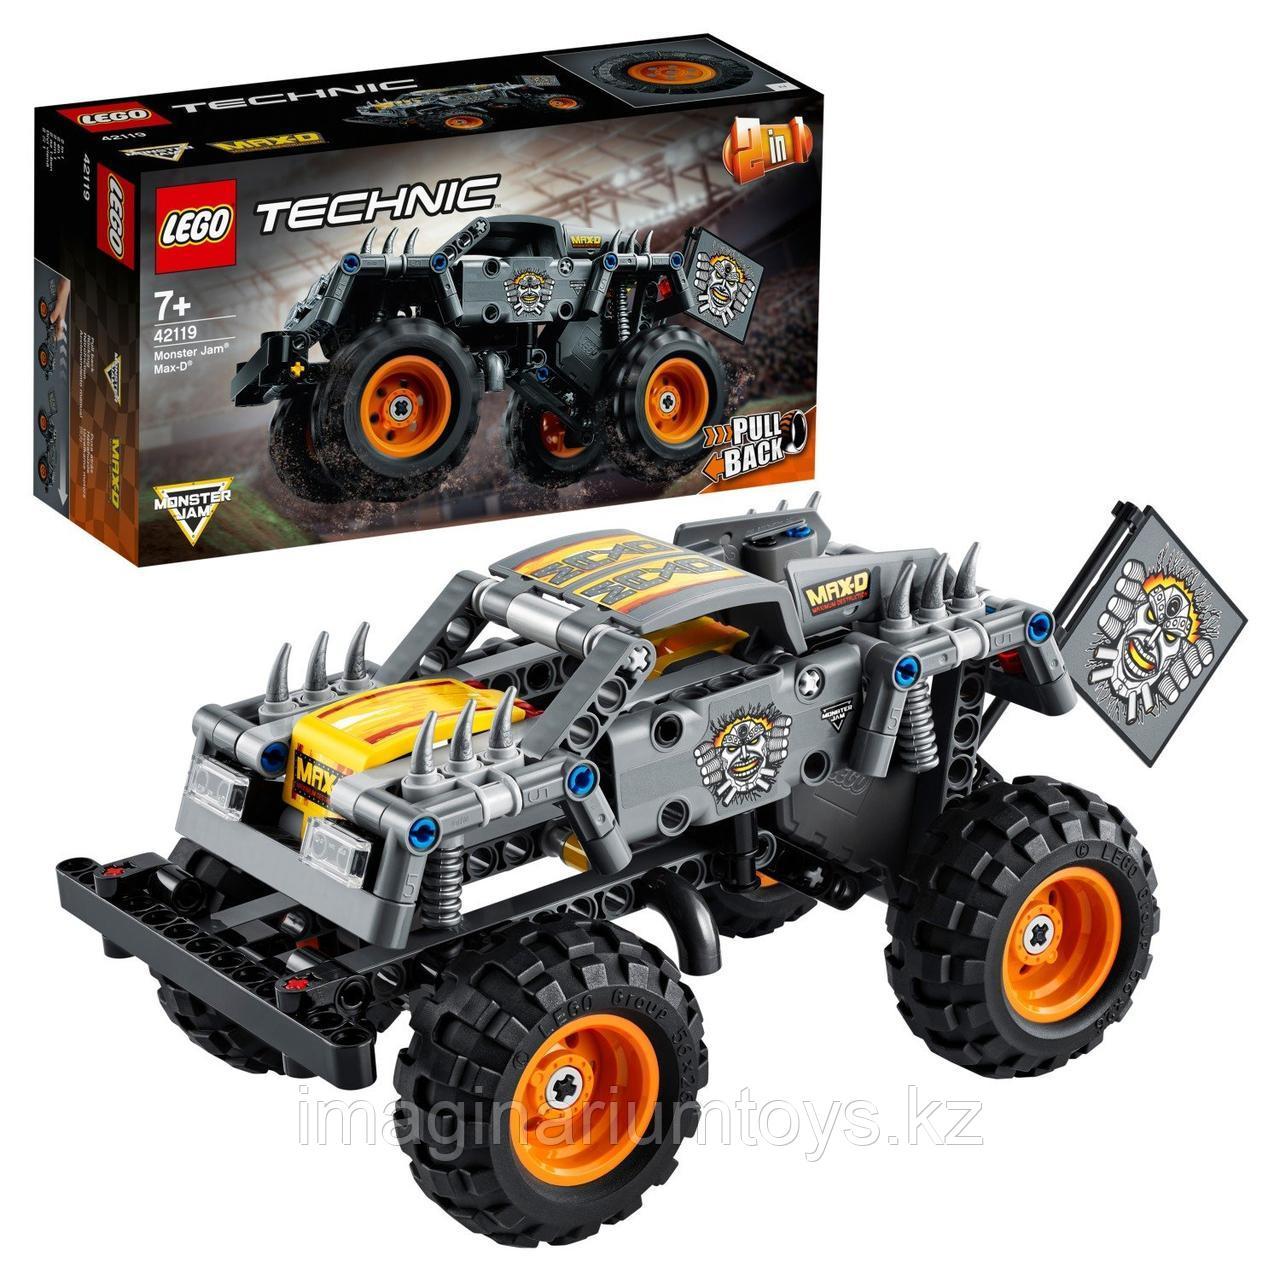 Конструктор LEGO Monster Jam Max-D Technic  42119